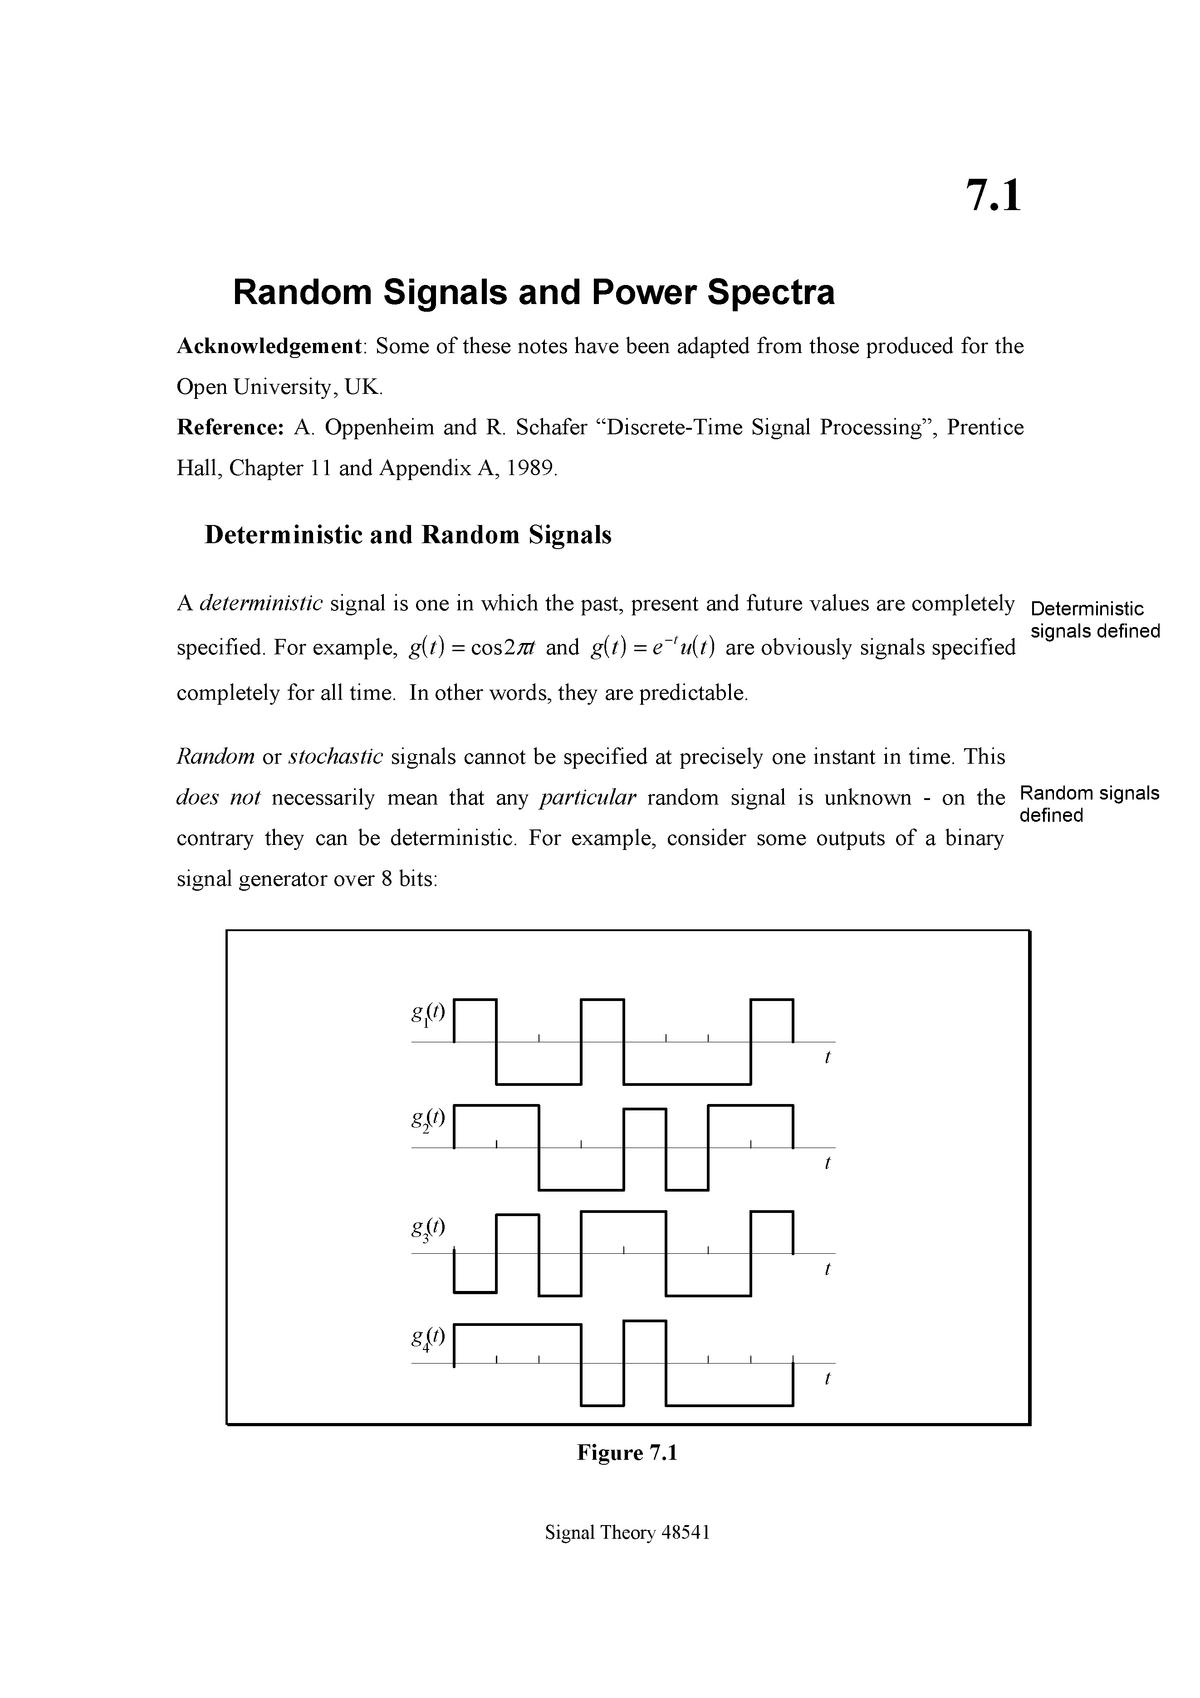 Notes 7 random signals - 048541 Signal Theory - UTS - StuDocu